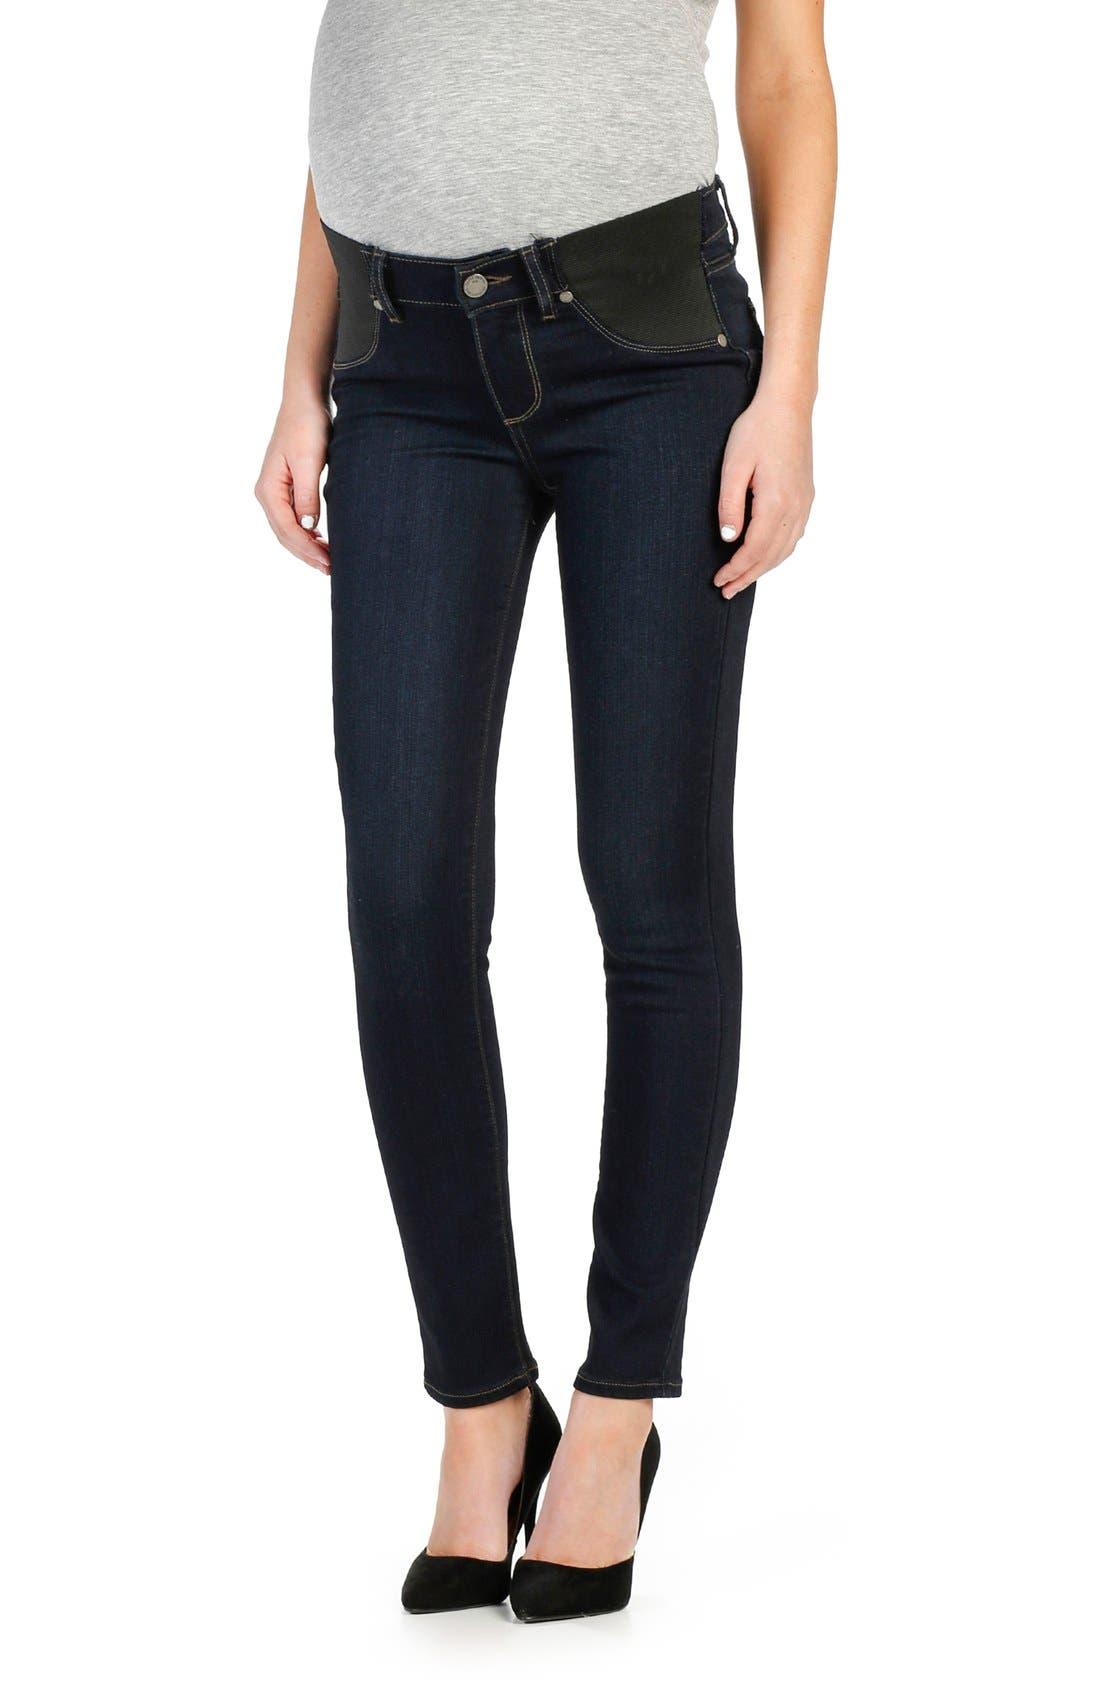 Women's Paige Transcend - Verdugo Ankle Skinny Maternity Jeans